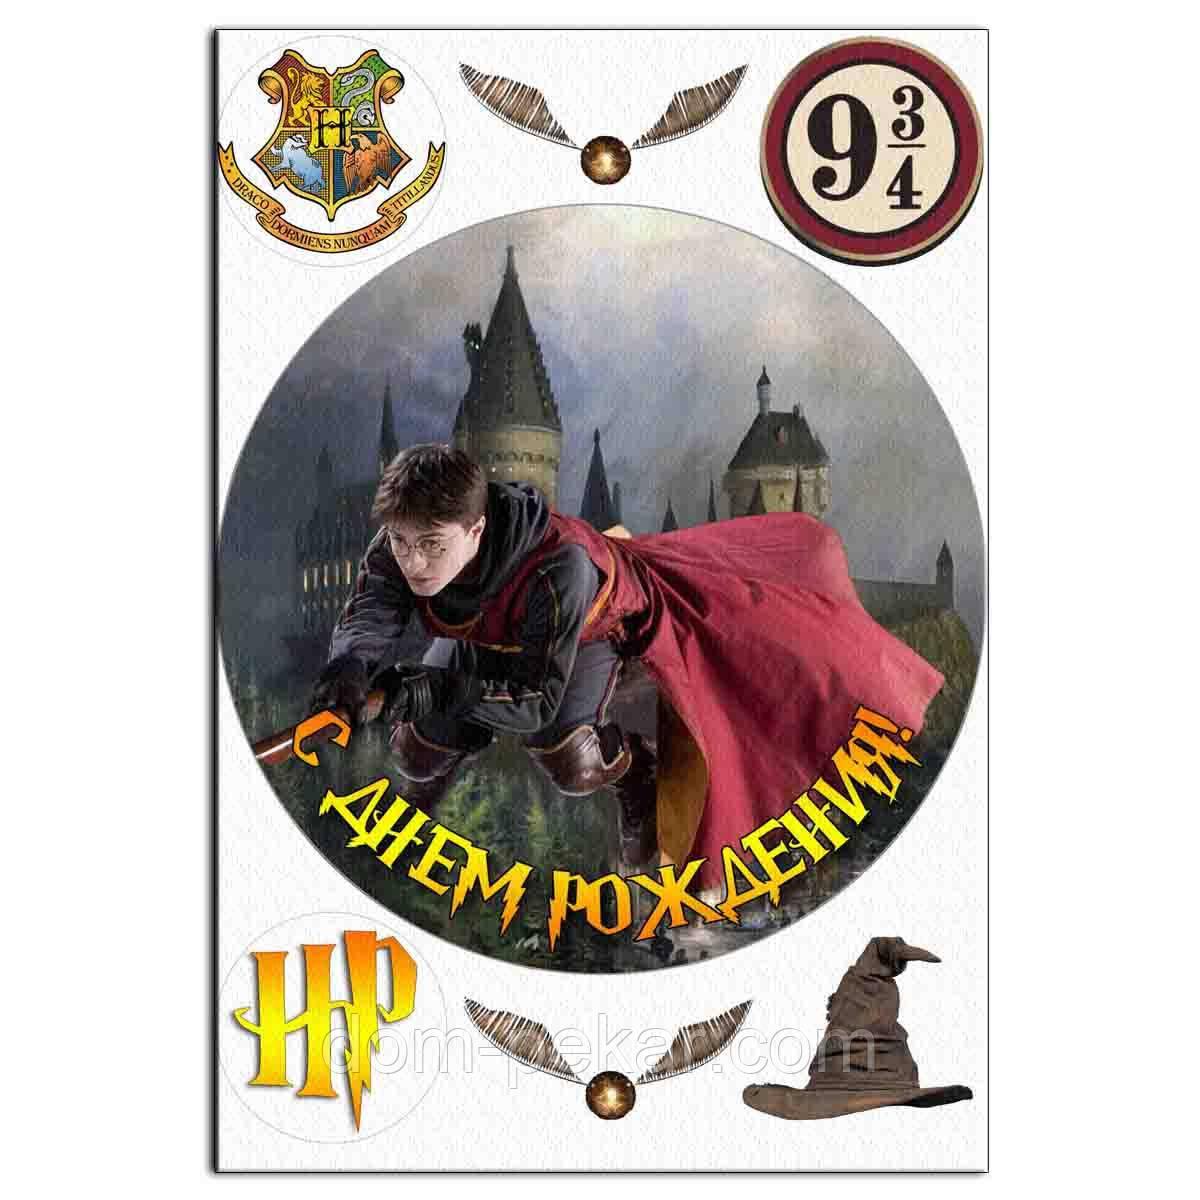 Гарри Поттер 1 вафельная картинка